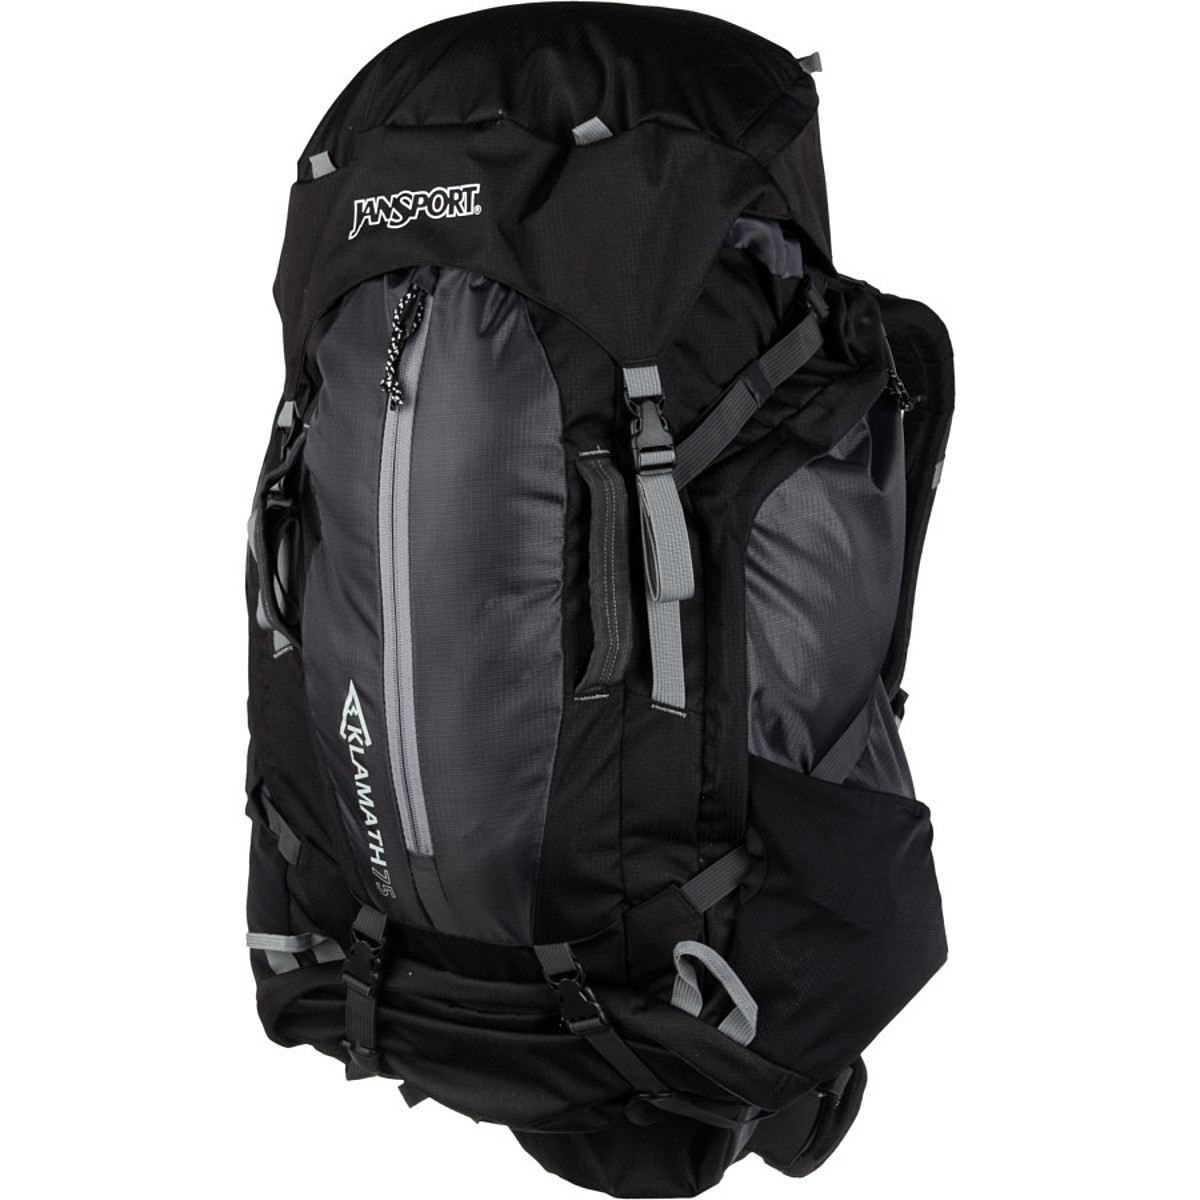 photo: JanSport Klamath 75 expedition pack (4,500+ cu in)